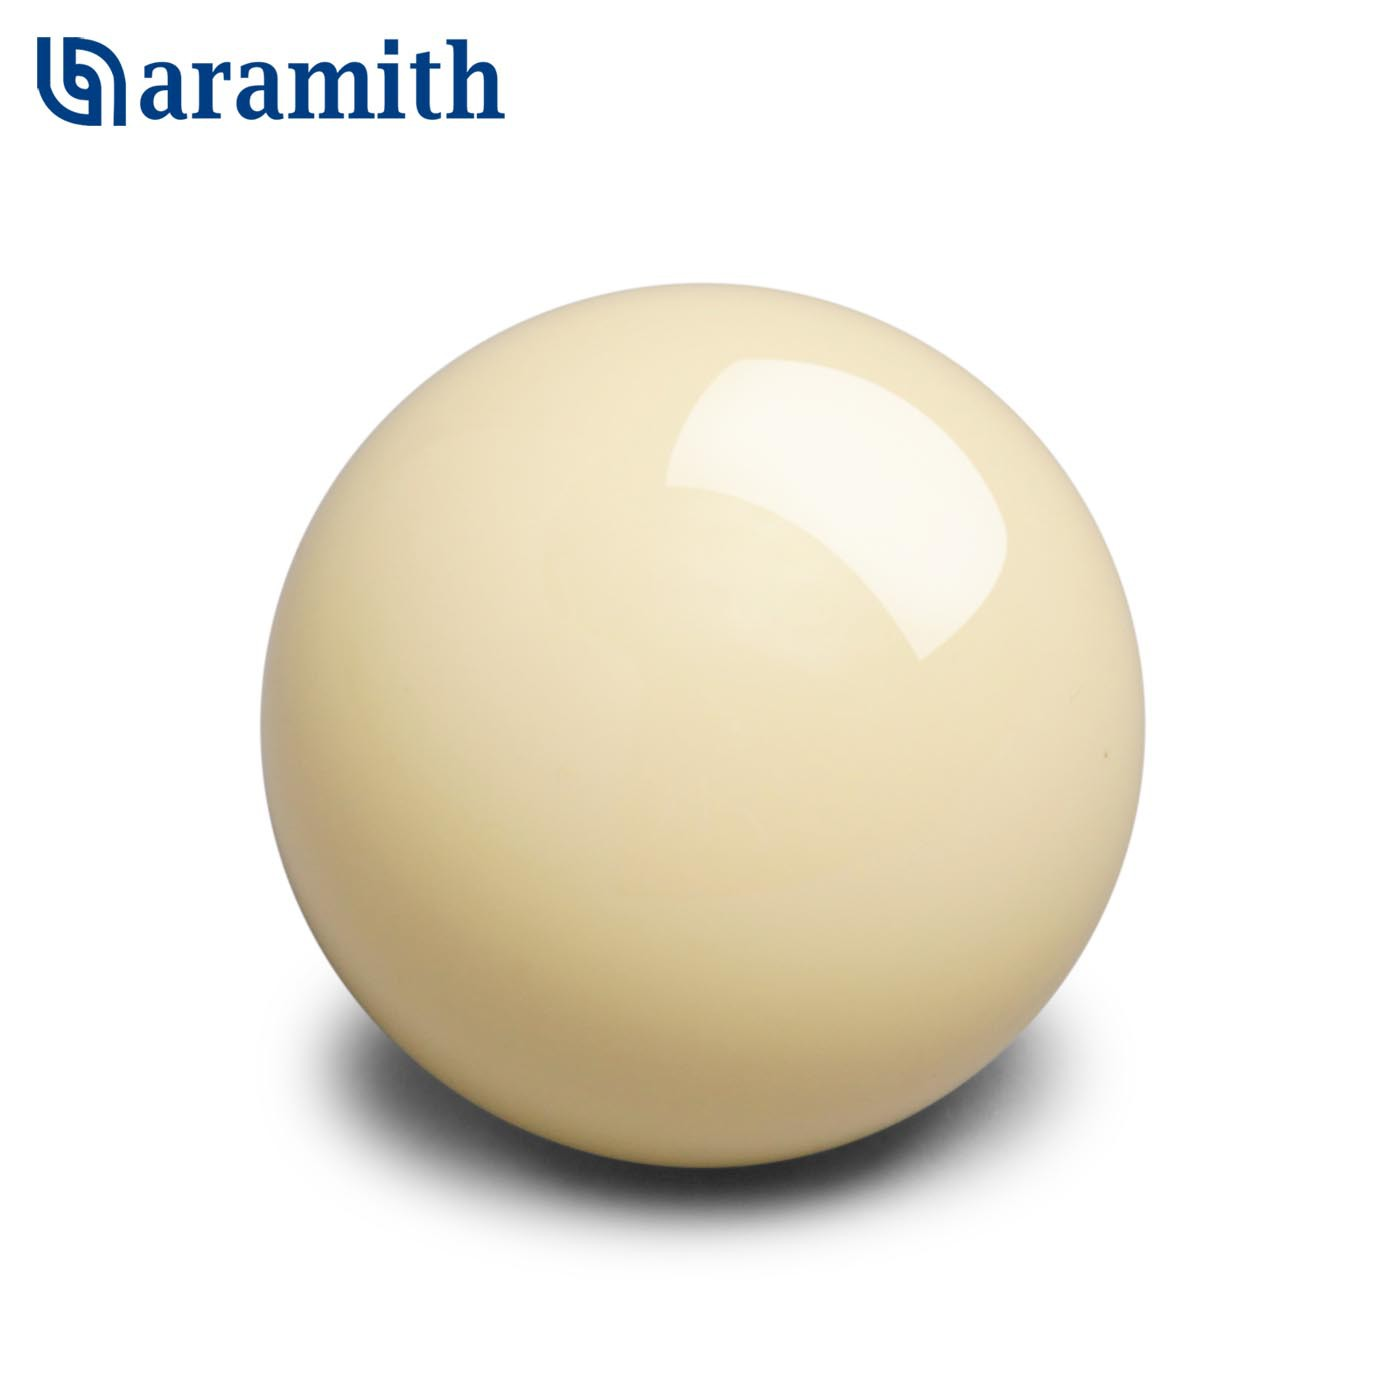 Биток для снукера Aramith Premier Snooker ø52,4мм белый